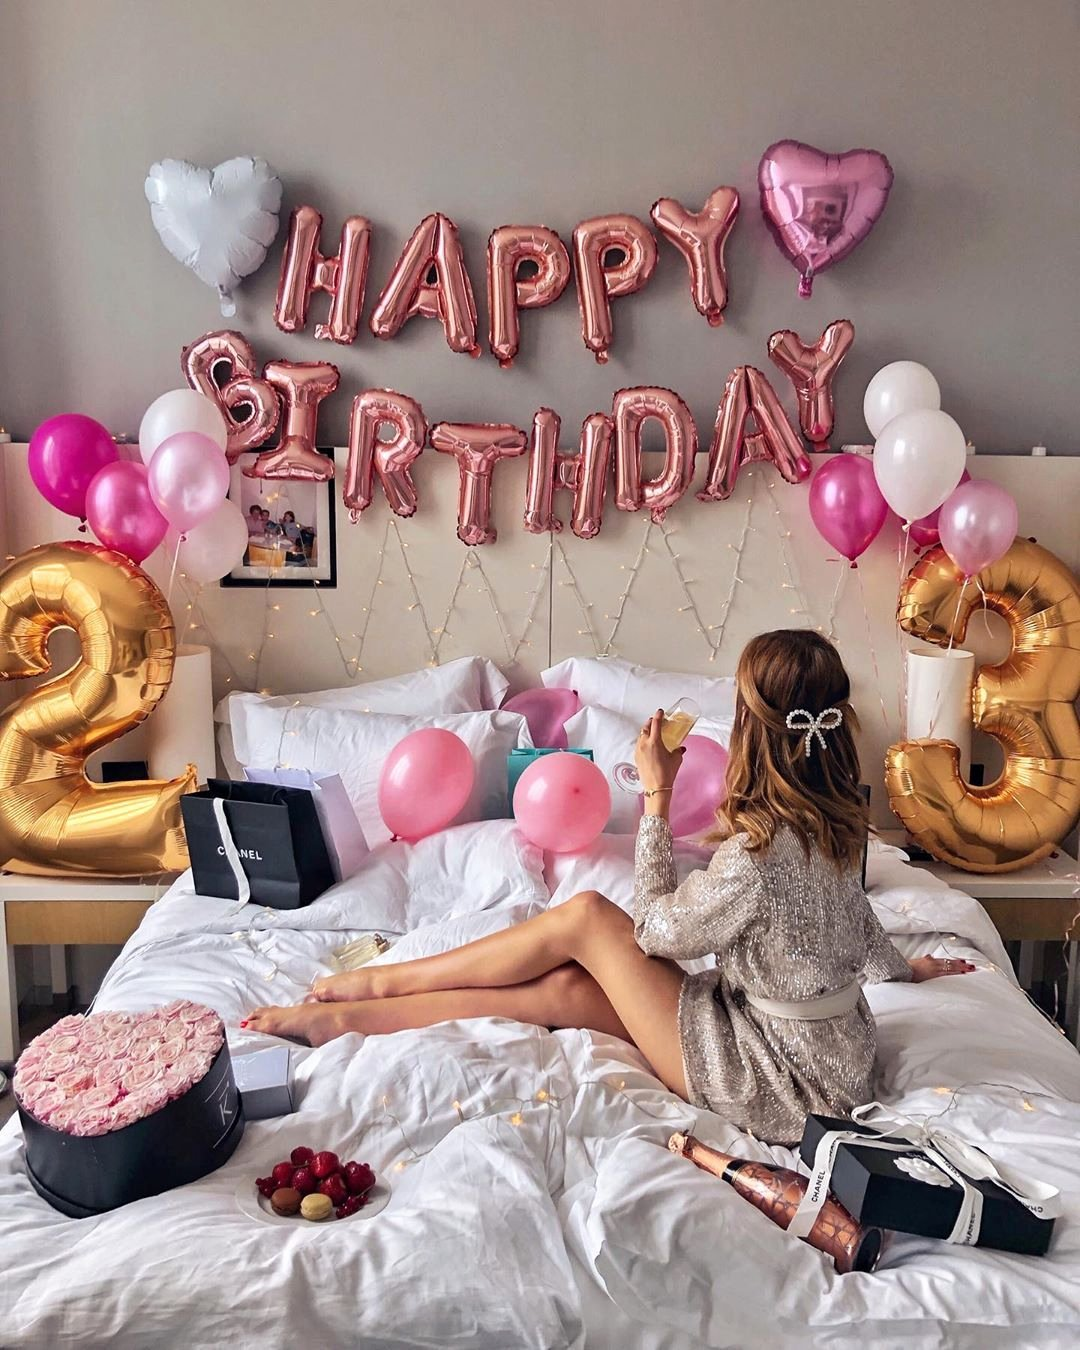 23rd Birthday Decoration Ideas Inspirational Birthday Girl 🎉 Celebrated My 23rd Birthday at